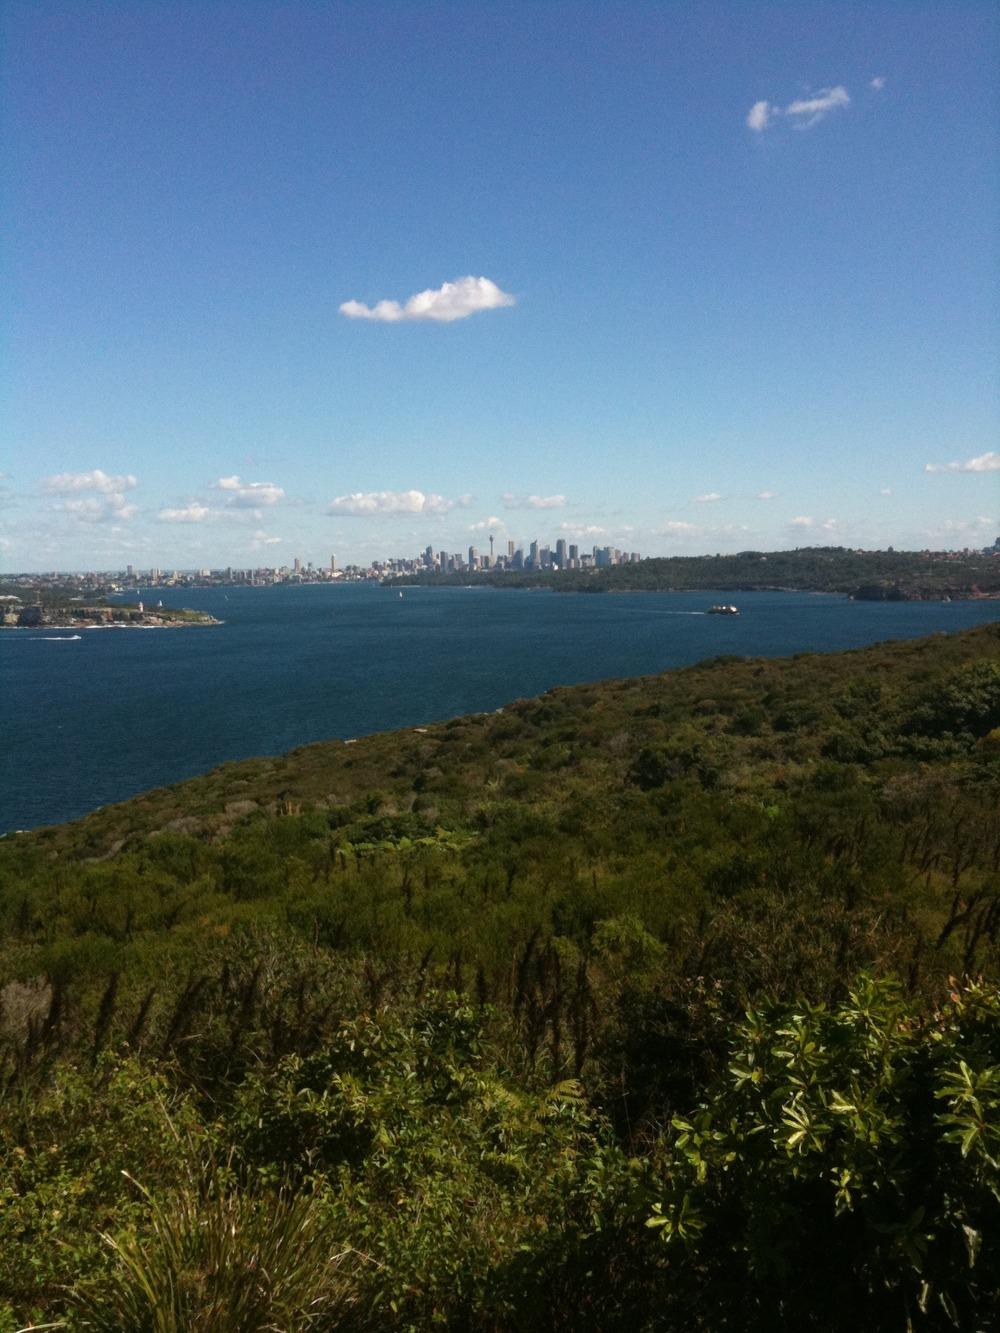 Enjoying life in Sydney